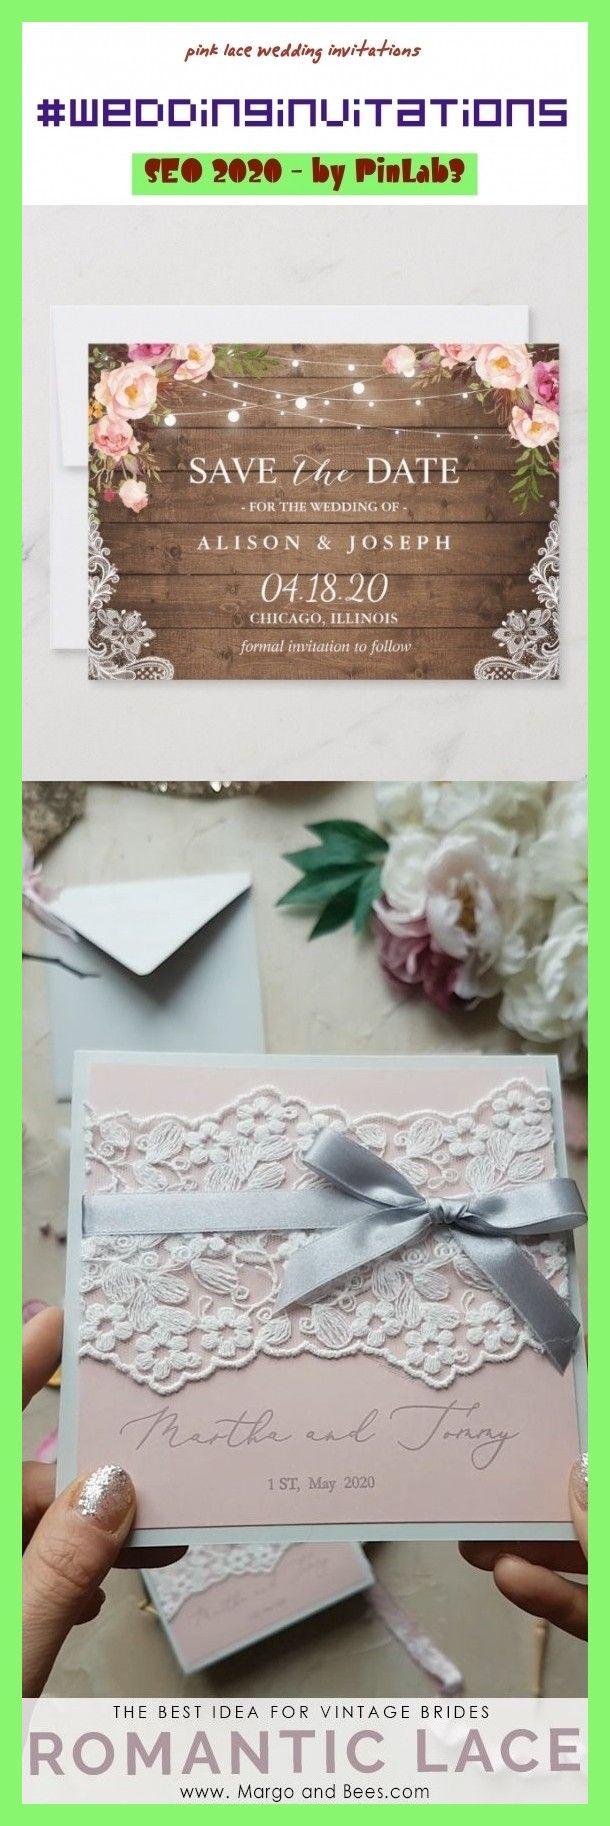 Pink Lace Wedding Invitations Wedding Invitations Spitzehochzeitseinla In 2020 Lace Wedding Invitations Wedding Invitations Rustic Lace Lace Wedding Invitations Diy